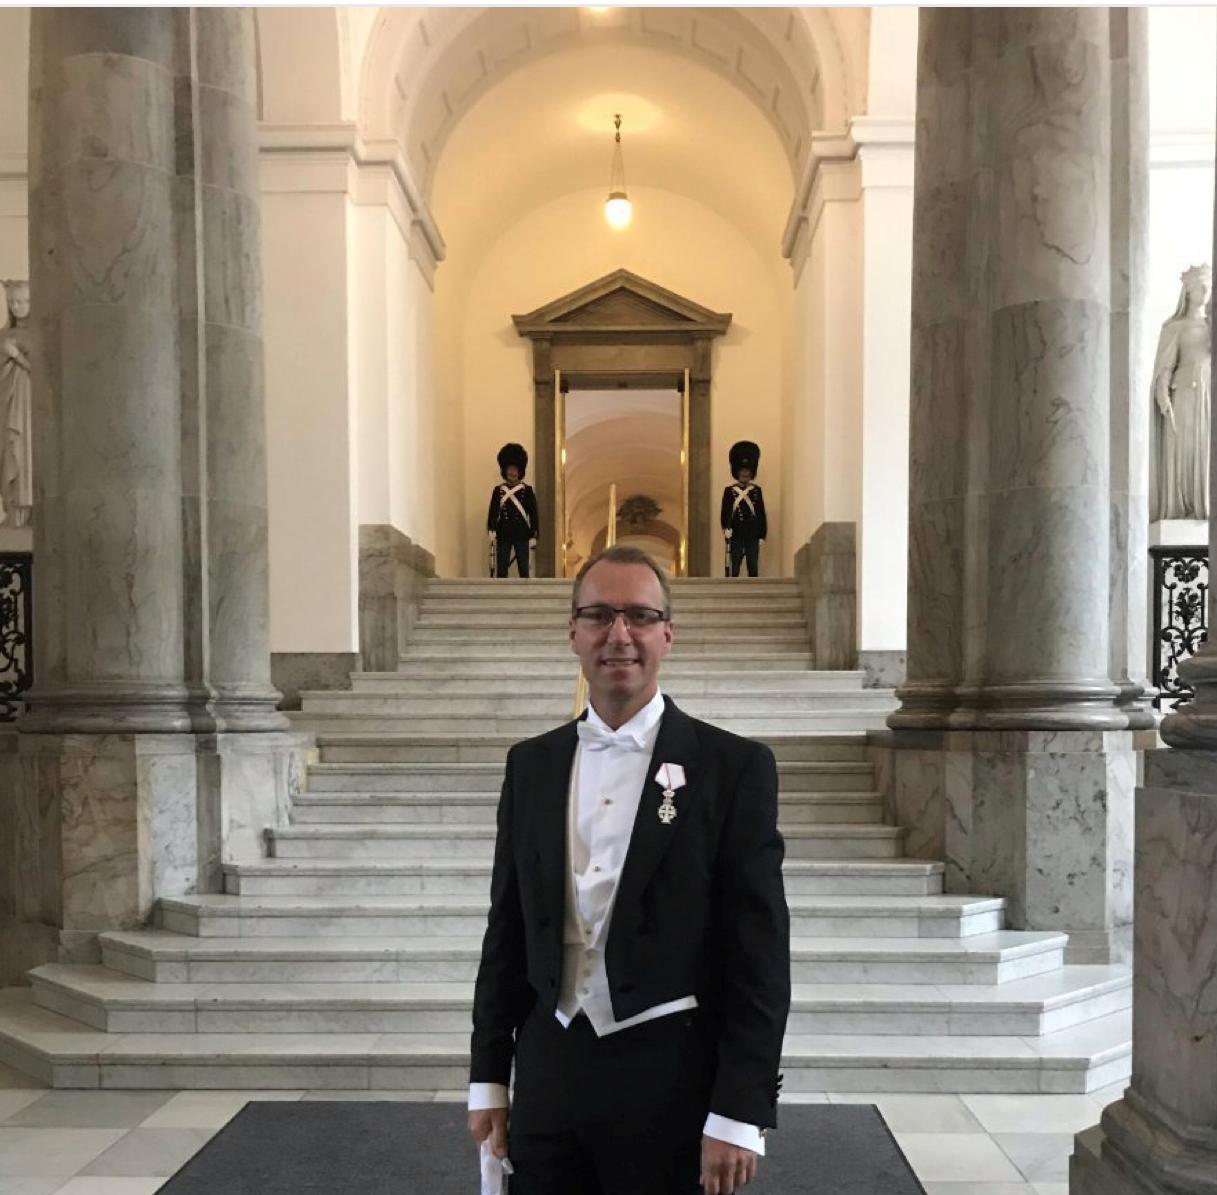 Jens Mathiesen ved Christiansborg i går, hvor han var i audiens hos Dronning Margrethe for at takke for Ridderkorset. Privatfoto.